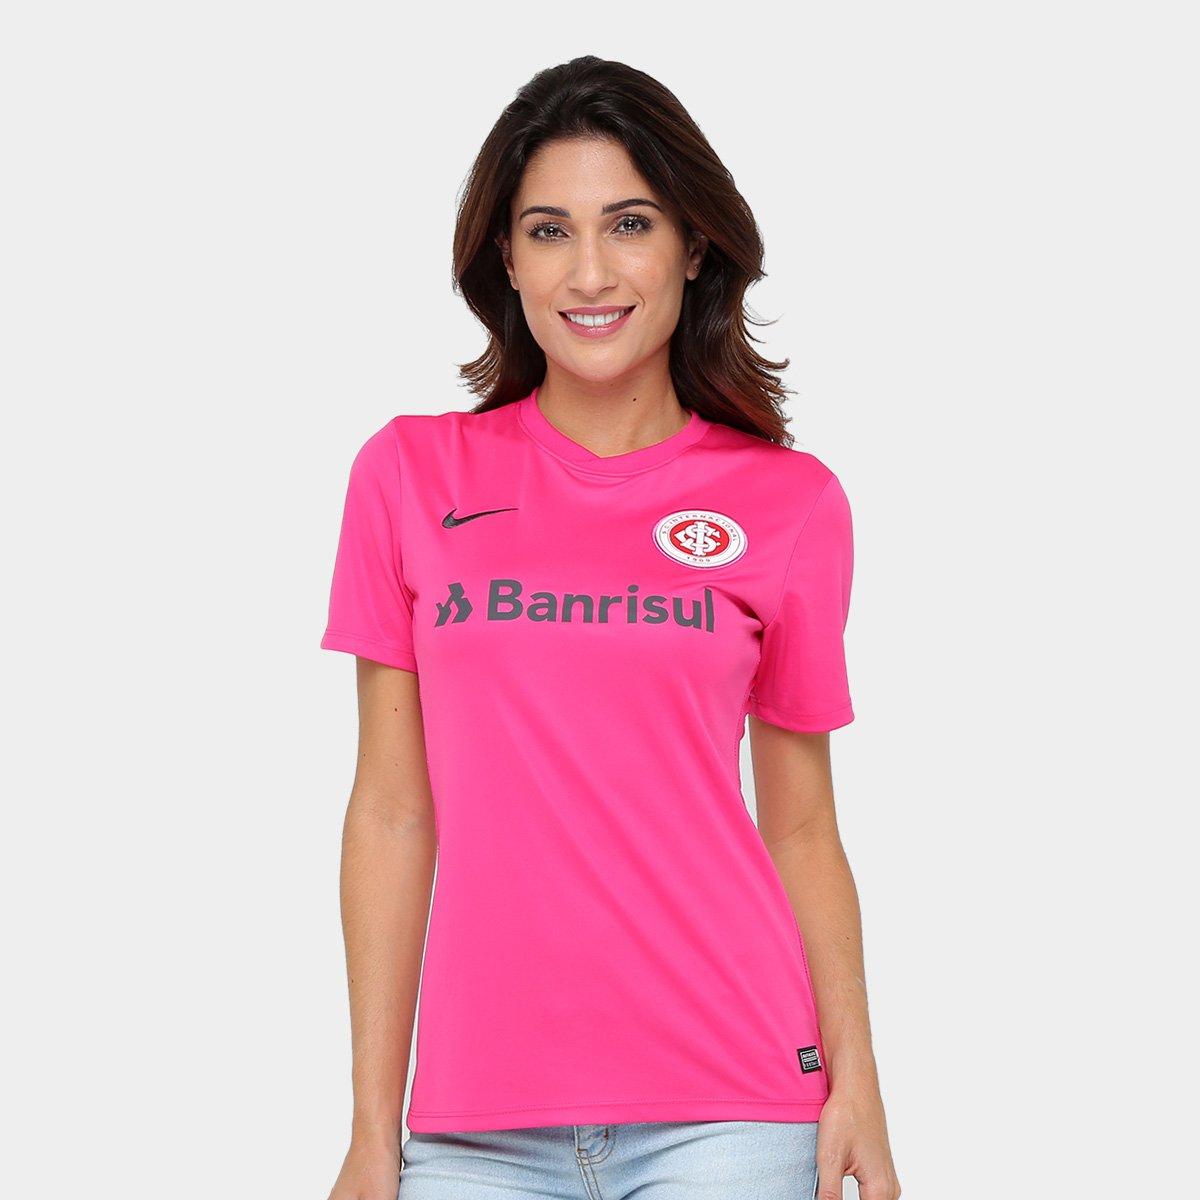 dd074ac99 Camisa Internacional Nike Feminina - Rosa e Chumbo